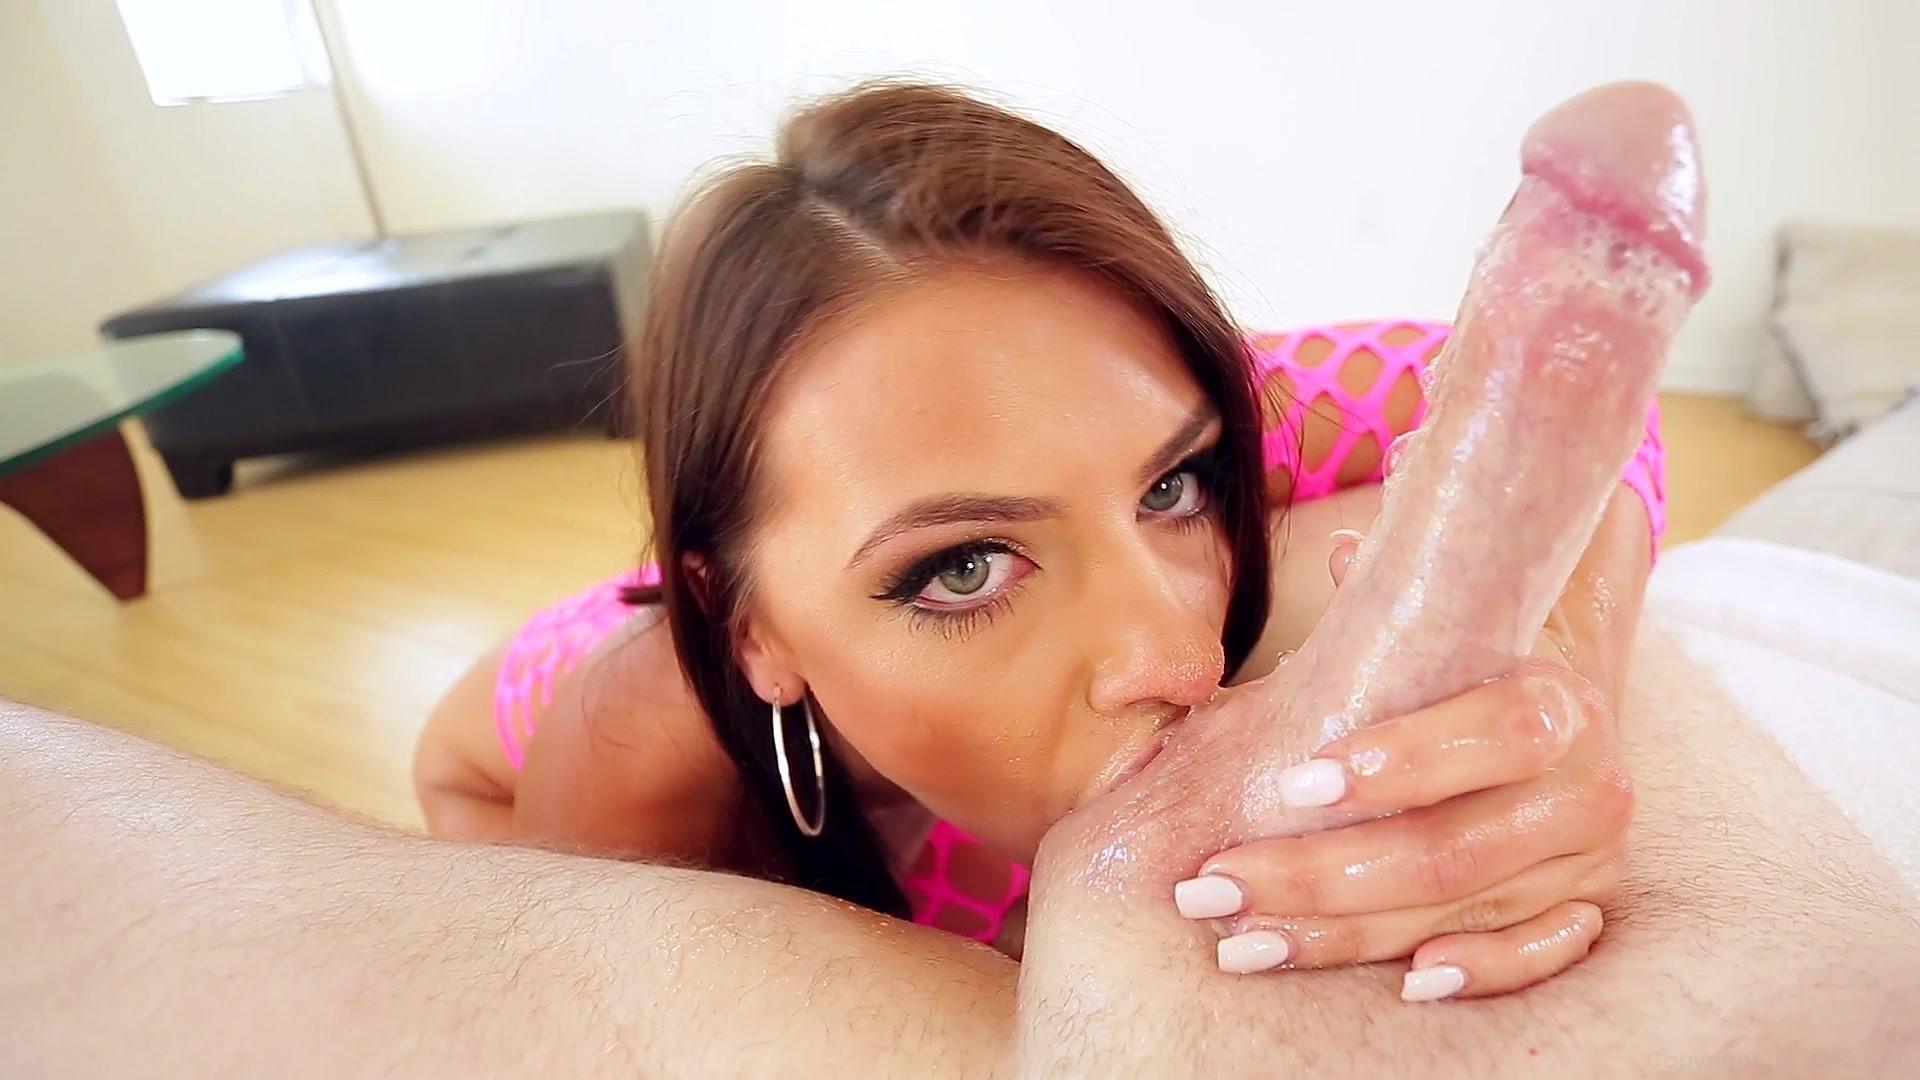 Mouth Fuck, Balls Suck Cum Ex Girlfriend Porn